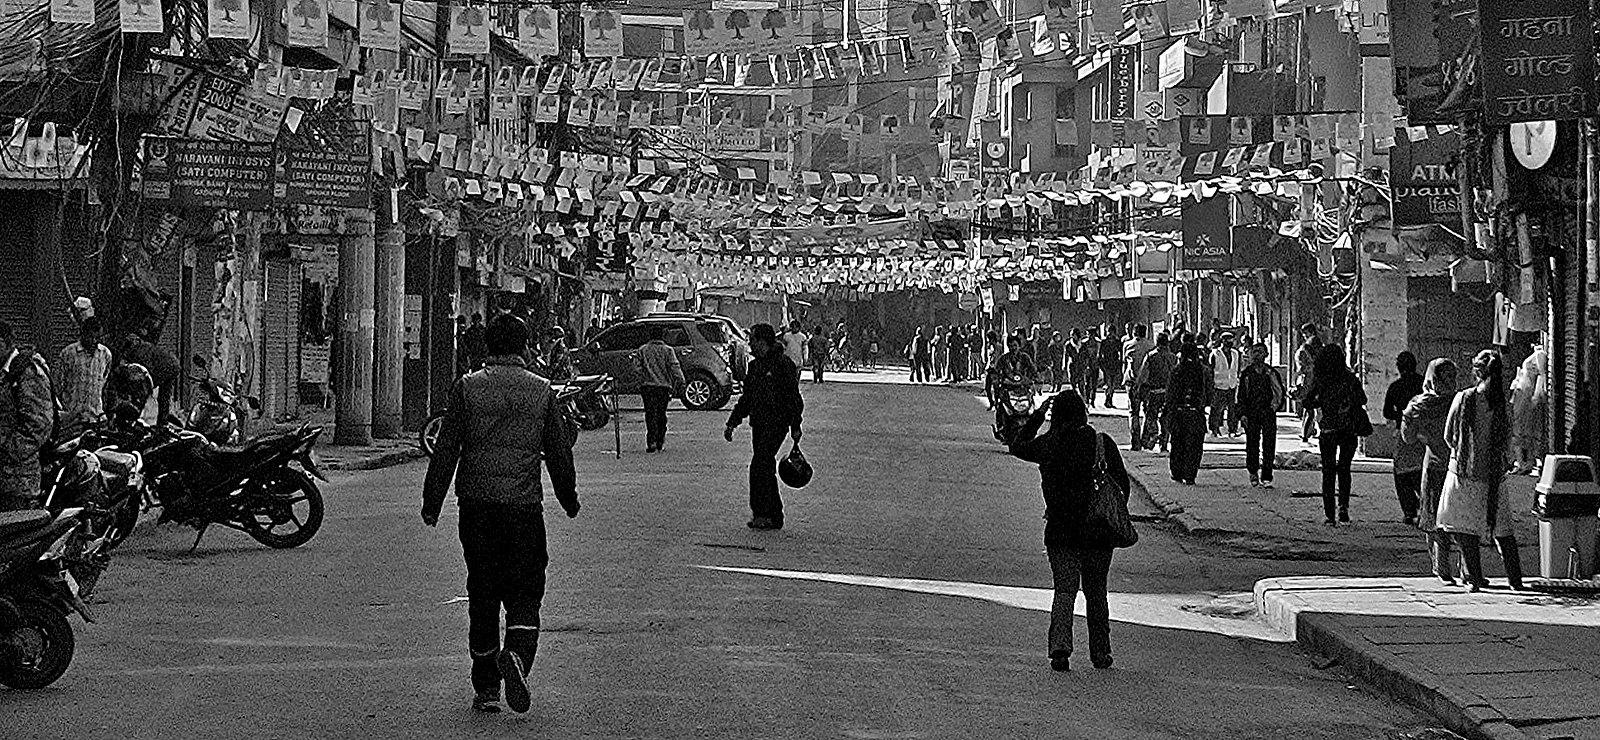 NEPAL, Kathmandu - unterwegs in der Altstadt, 15017/7651